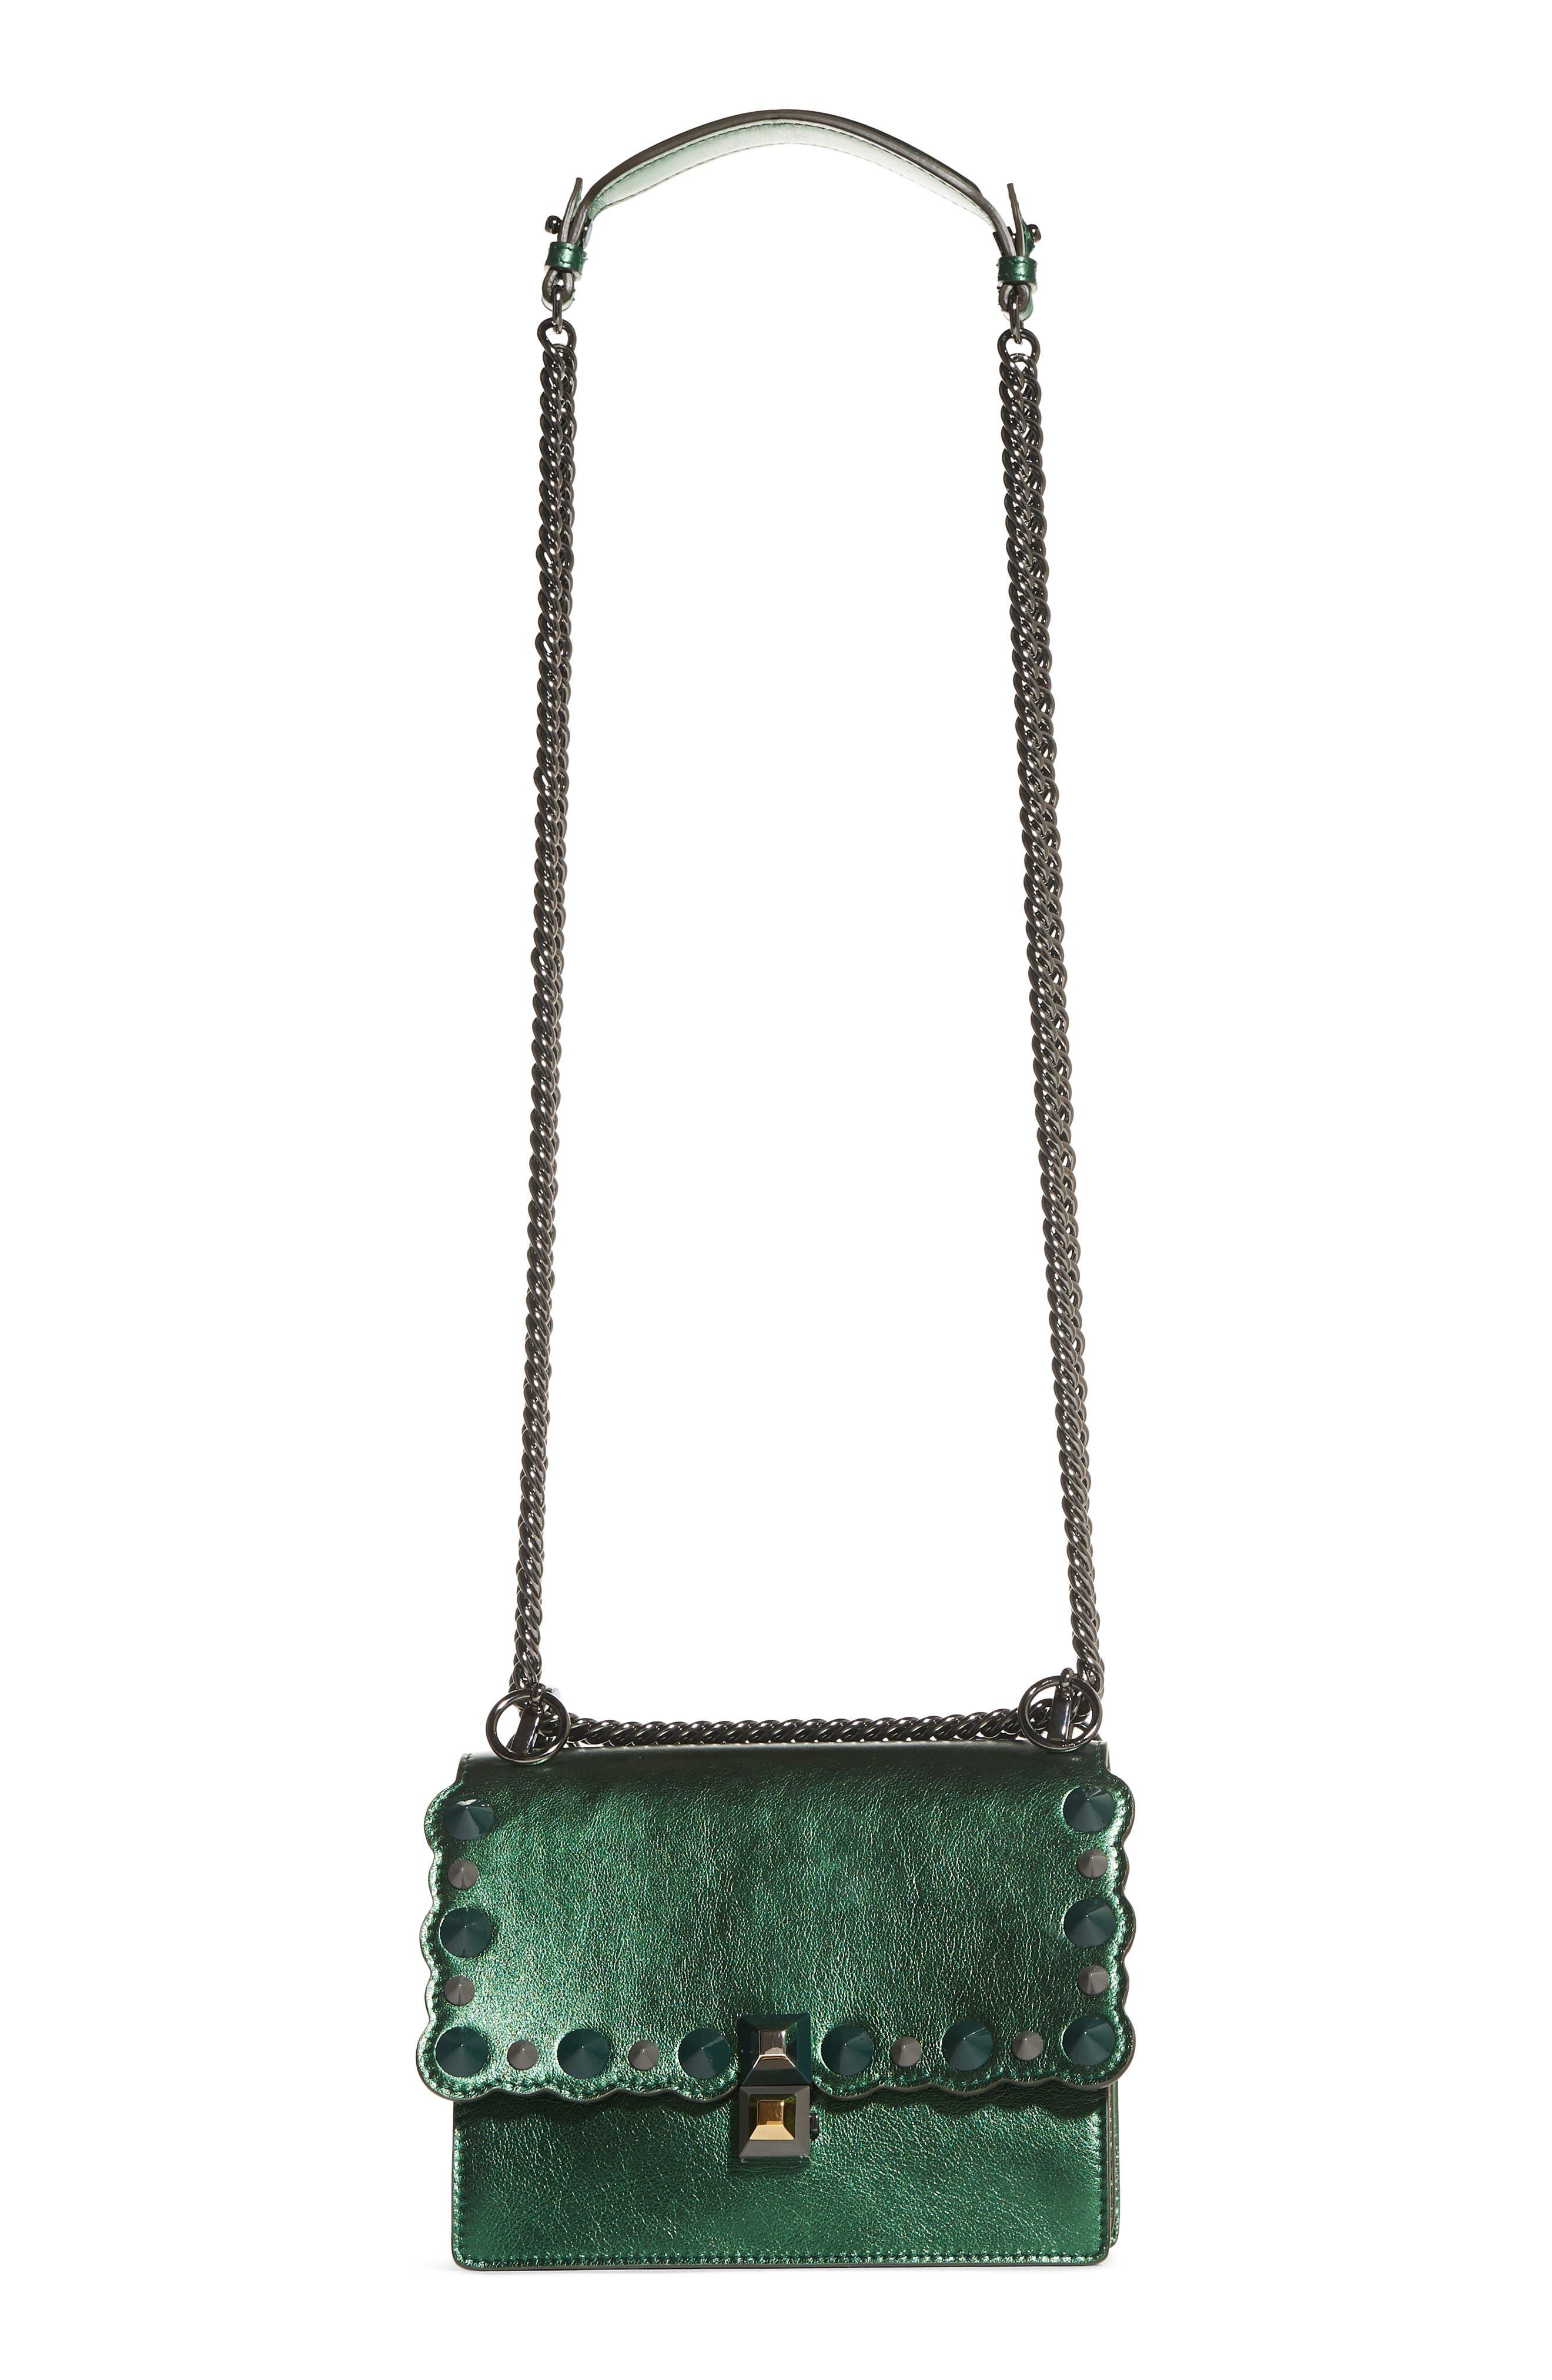 Small Kan I Metallic Leather Shoulder Bag,                         Main,                         color, GREEN METALLIC